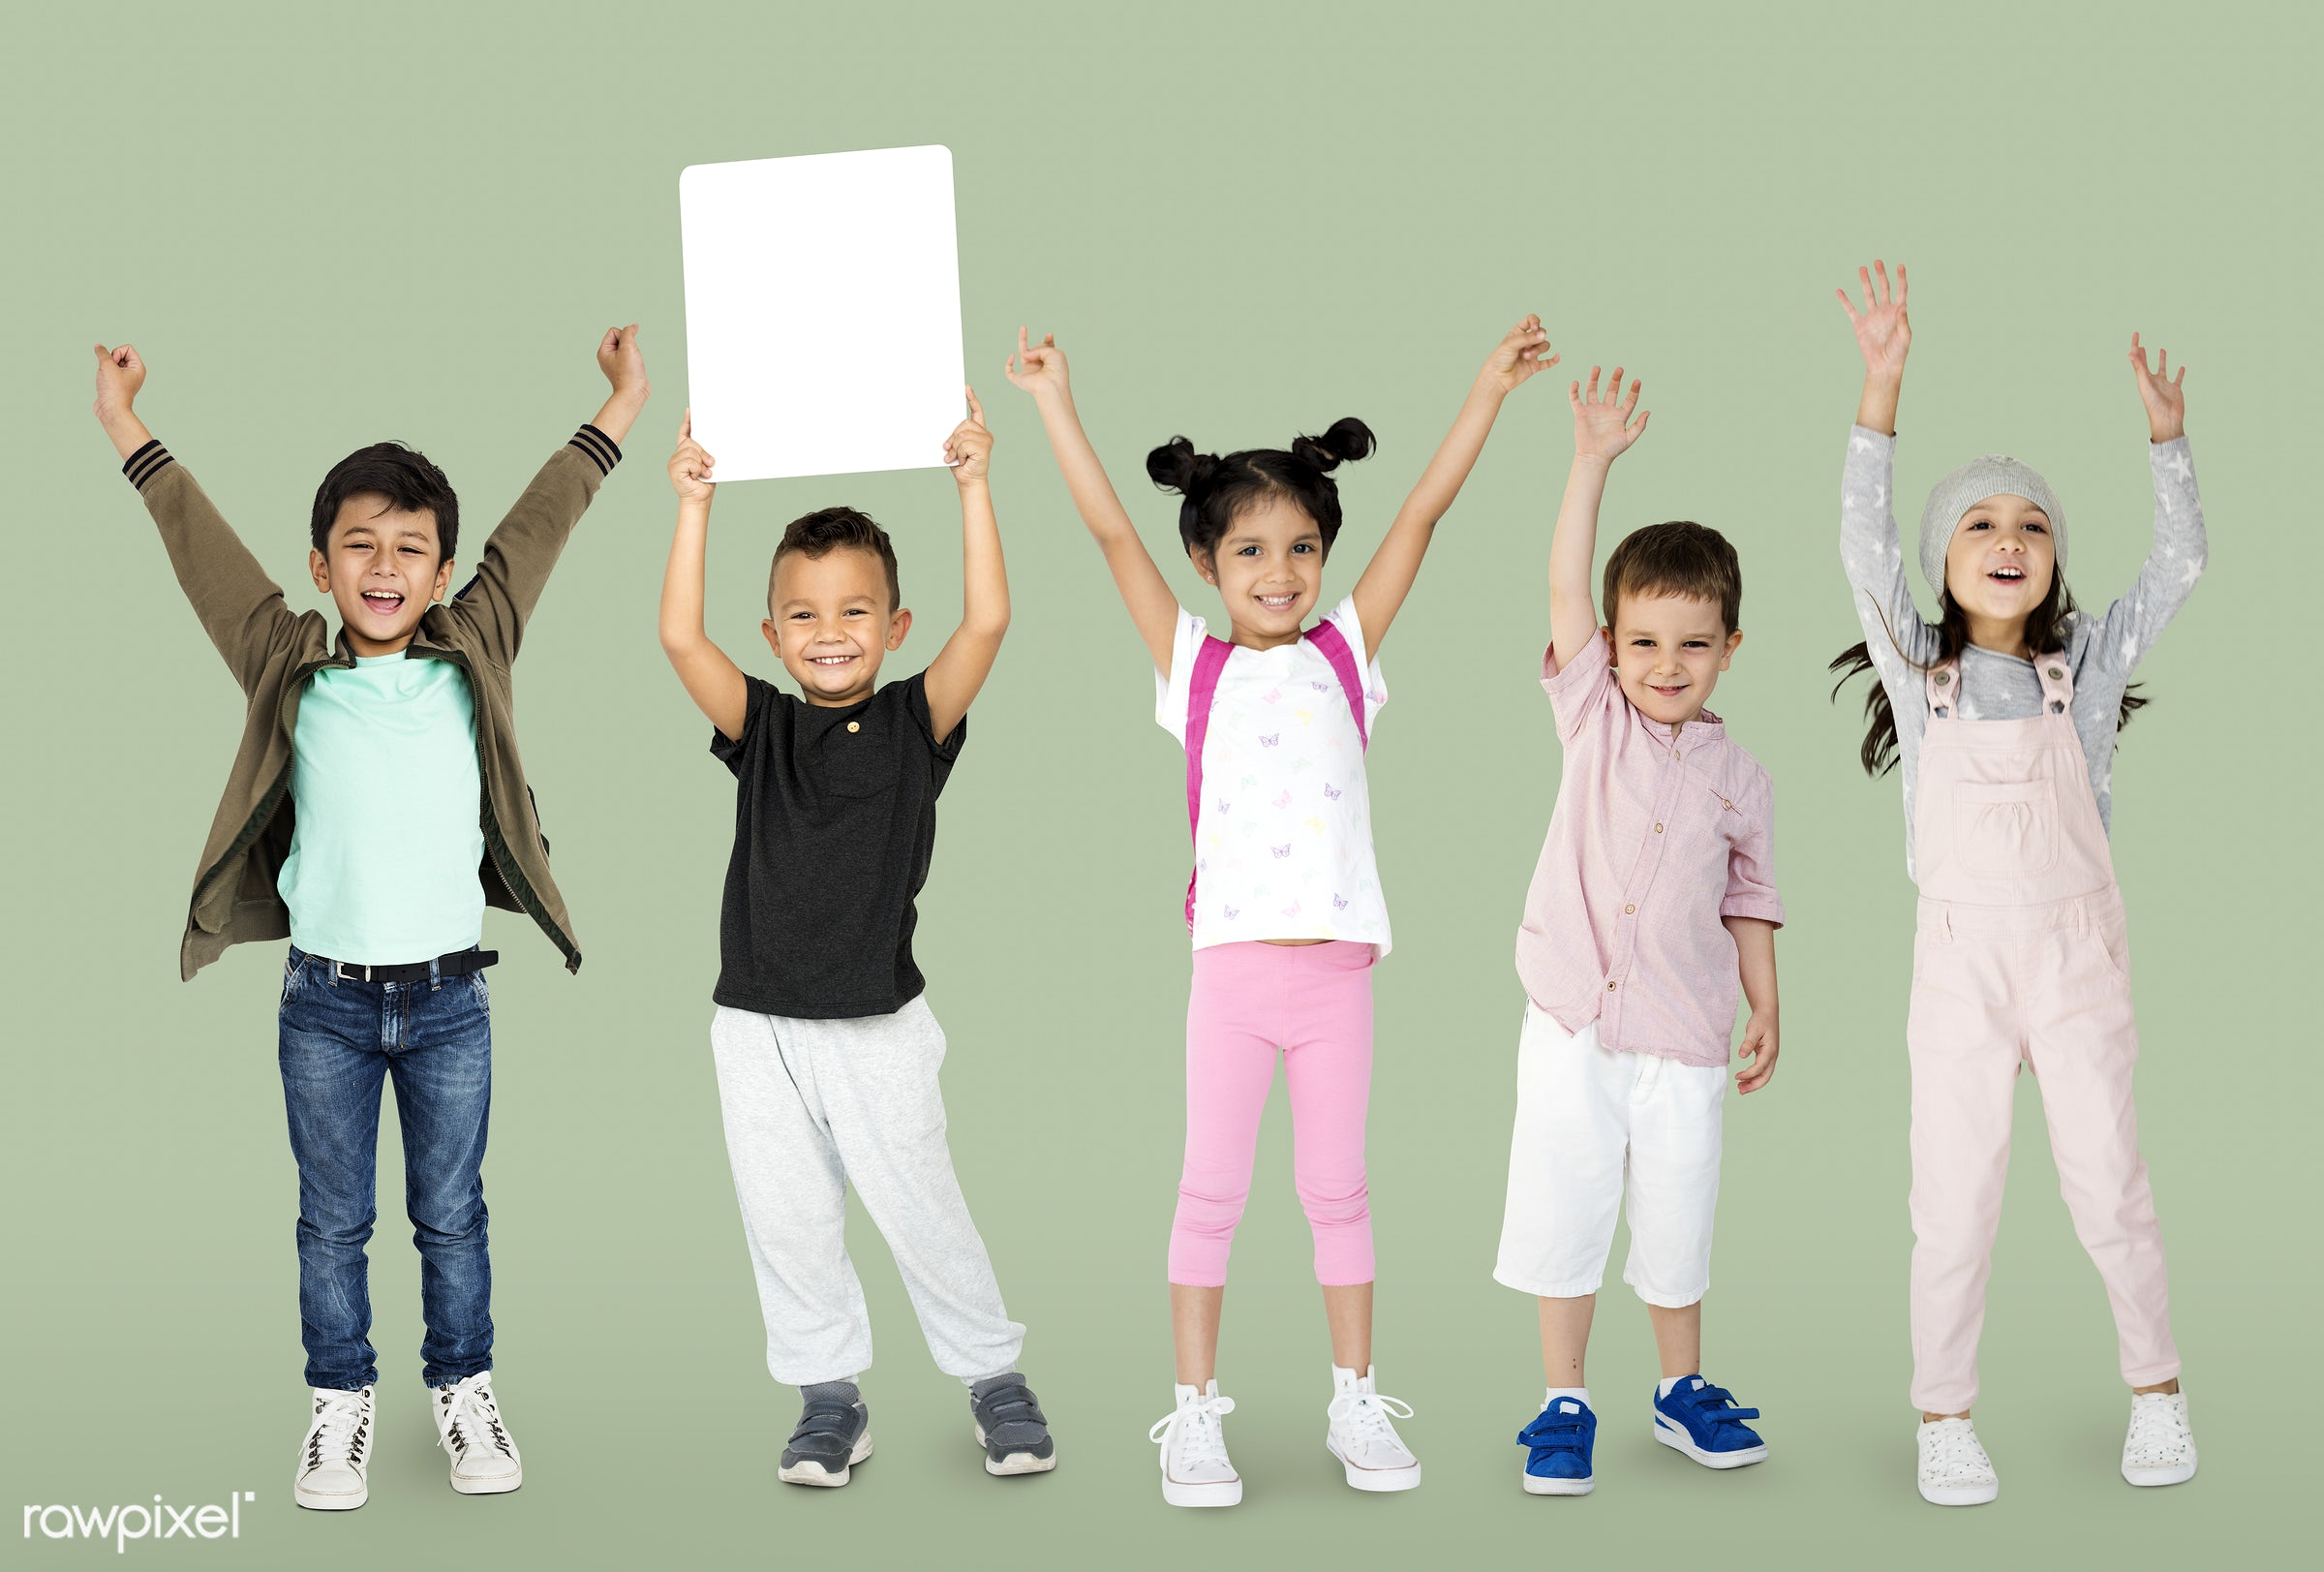 studio, copy space, person, playful, paper, children, little, entertain, show, people, caucasian, kid, child, girl, boys,...